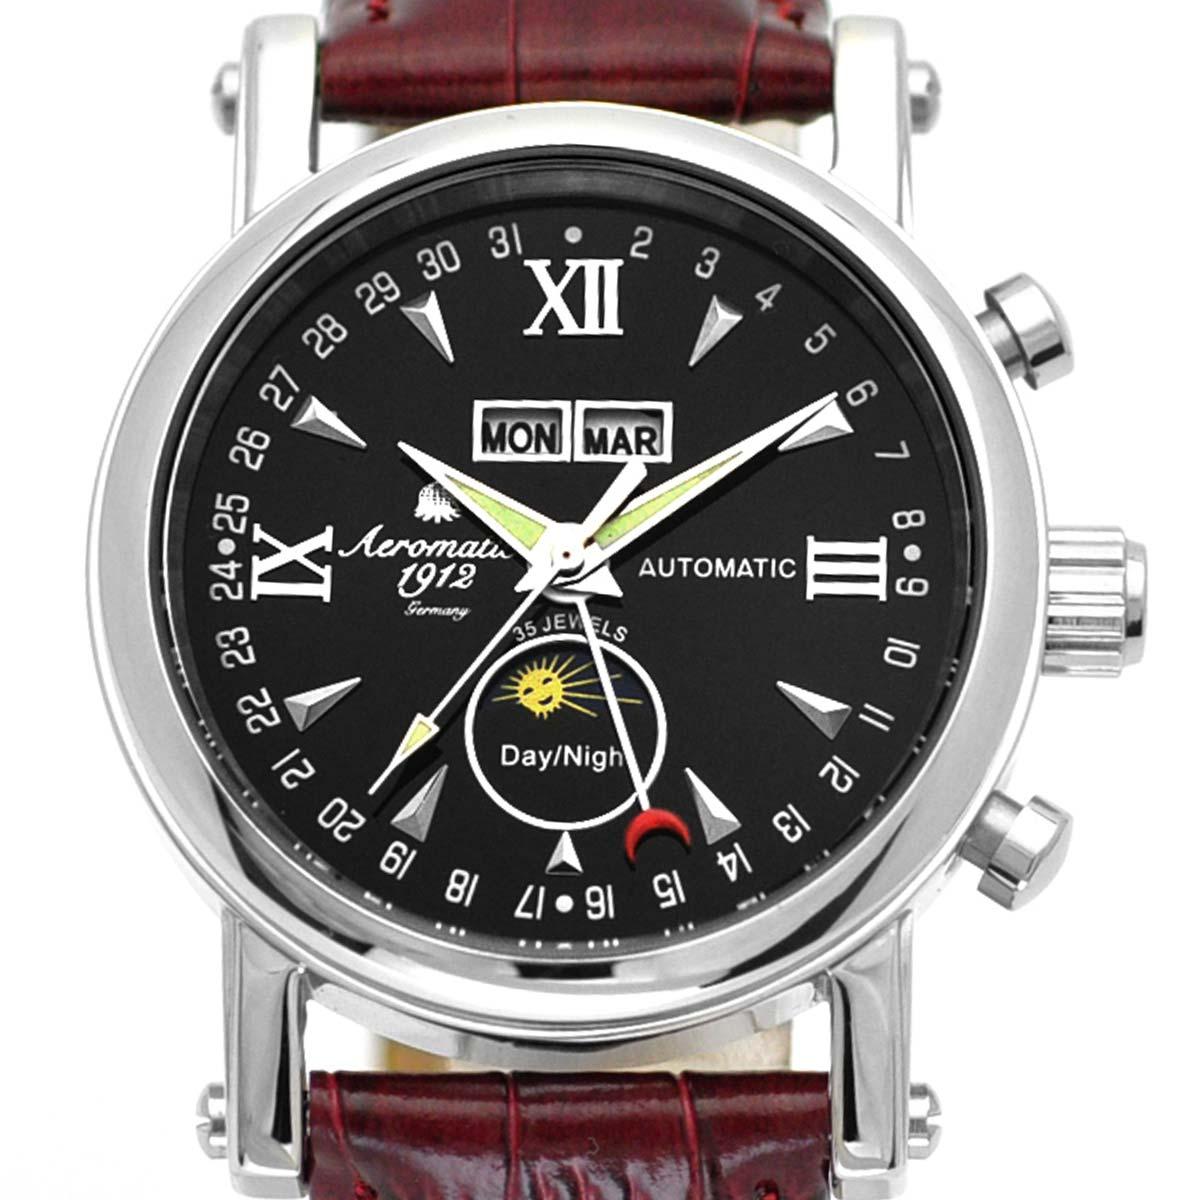 Aeromatic1912 エアロマティック エアロマチック 自動巻き 腕時計 メンズ パイロットウォッチ [A1032B] 並行輸入品 メーカー保証24ヵ月 収納ケース付き